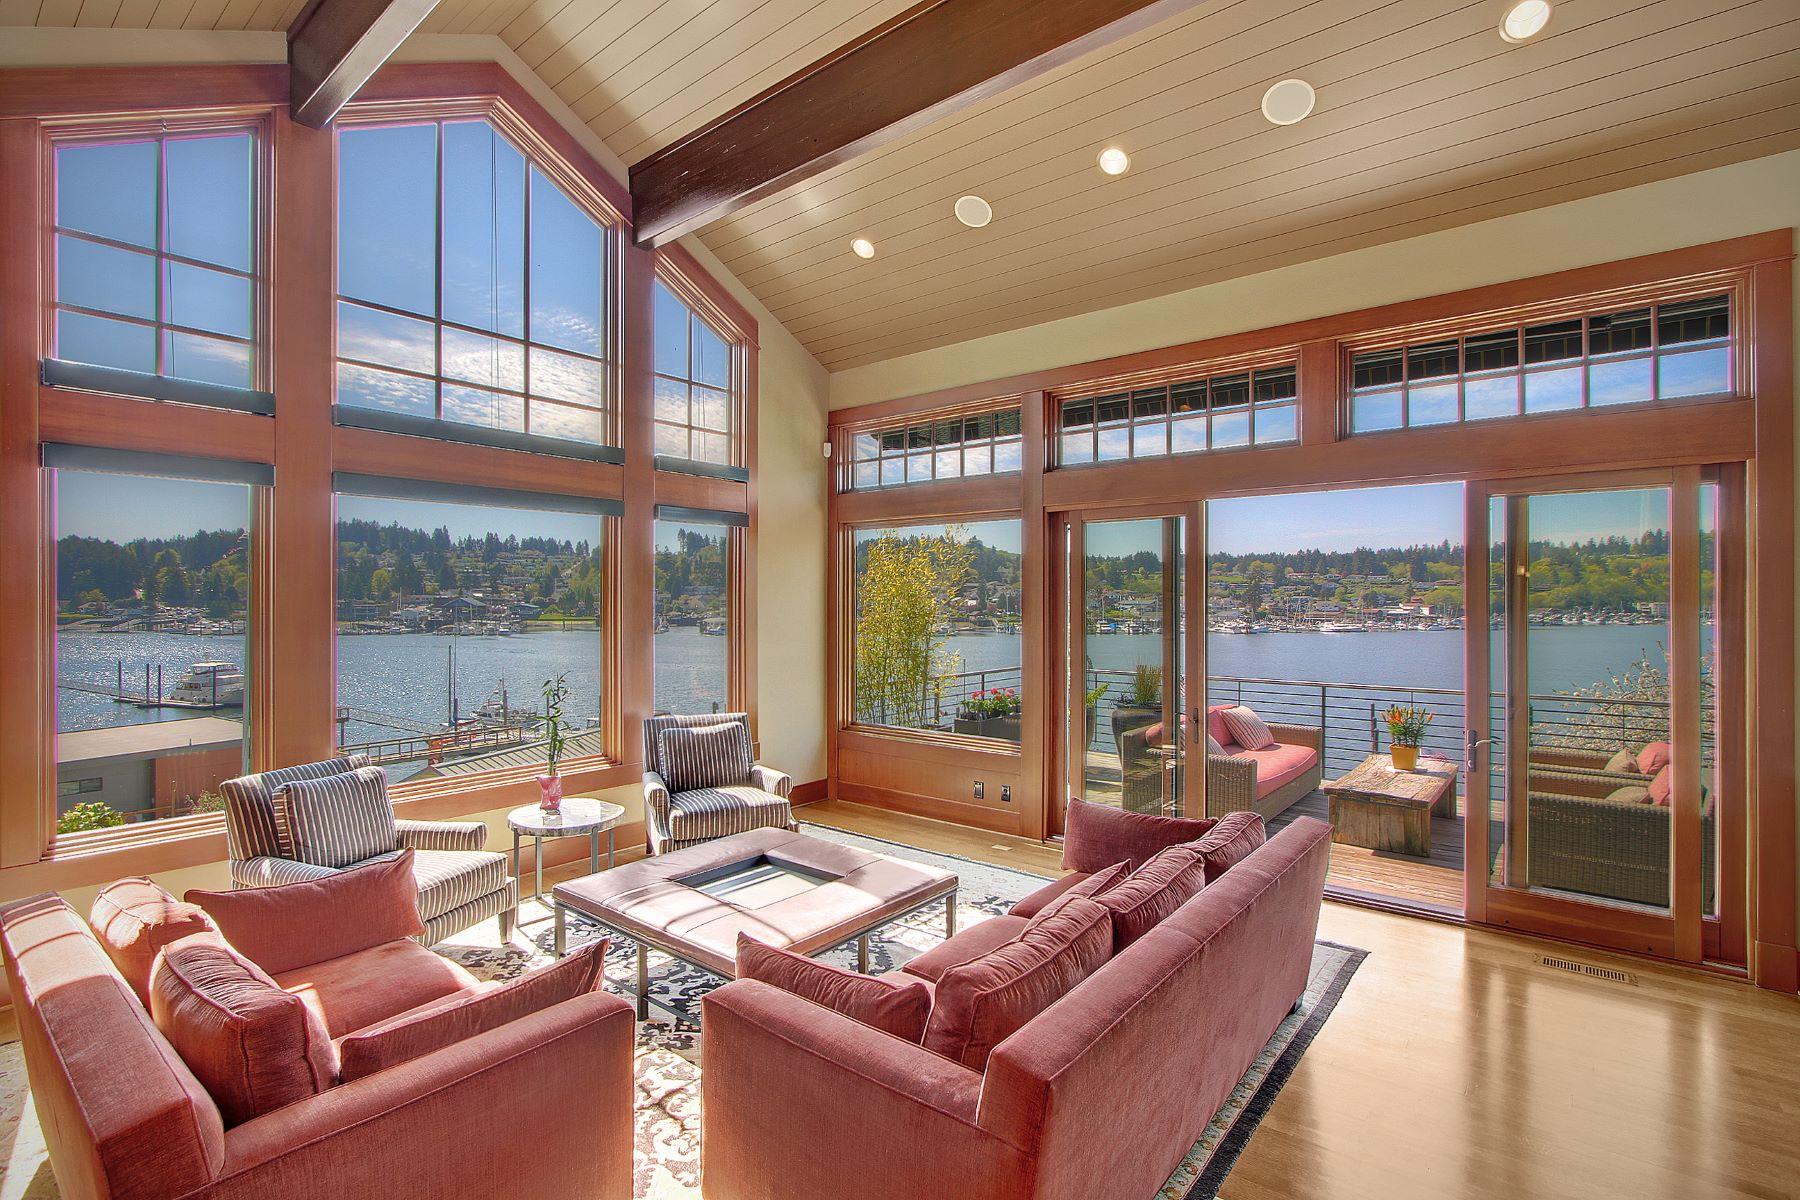 Single Family Home for Sale at GoodmanDrive.com 8424 Goodman Drive NW Gig Harbor, Washington 98332 United States